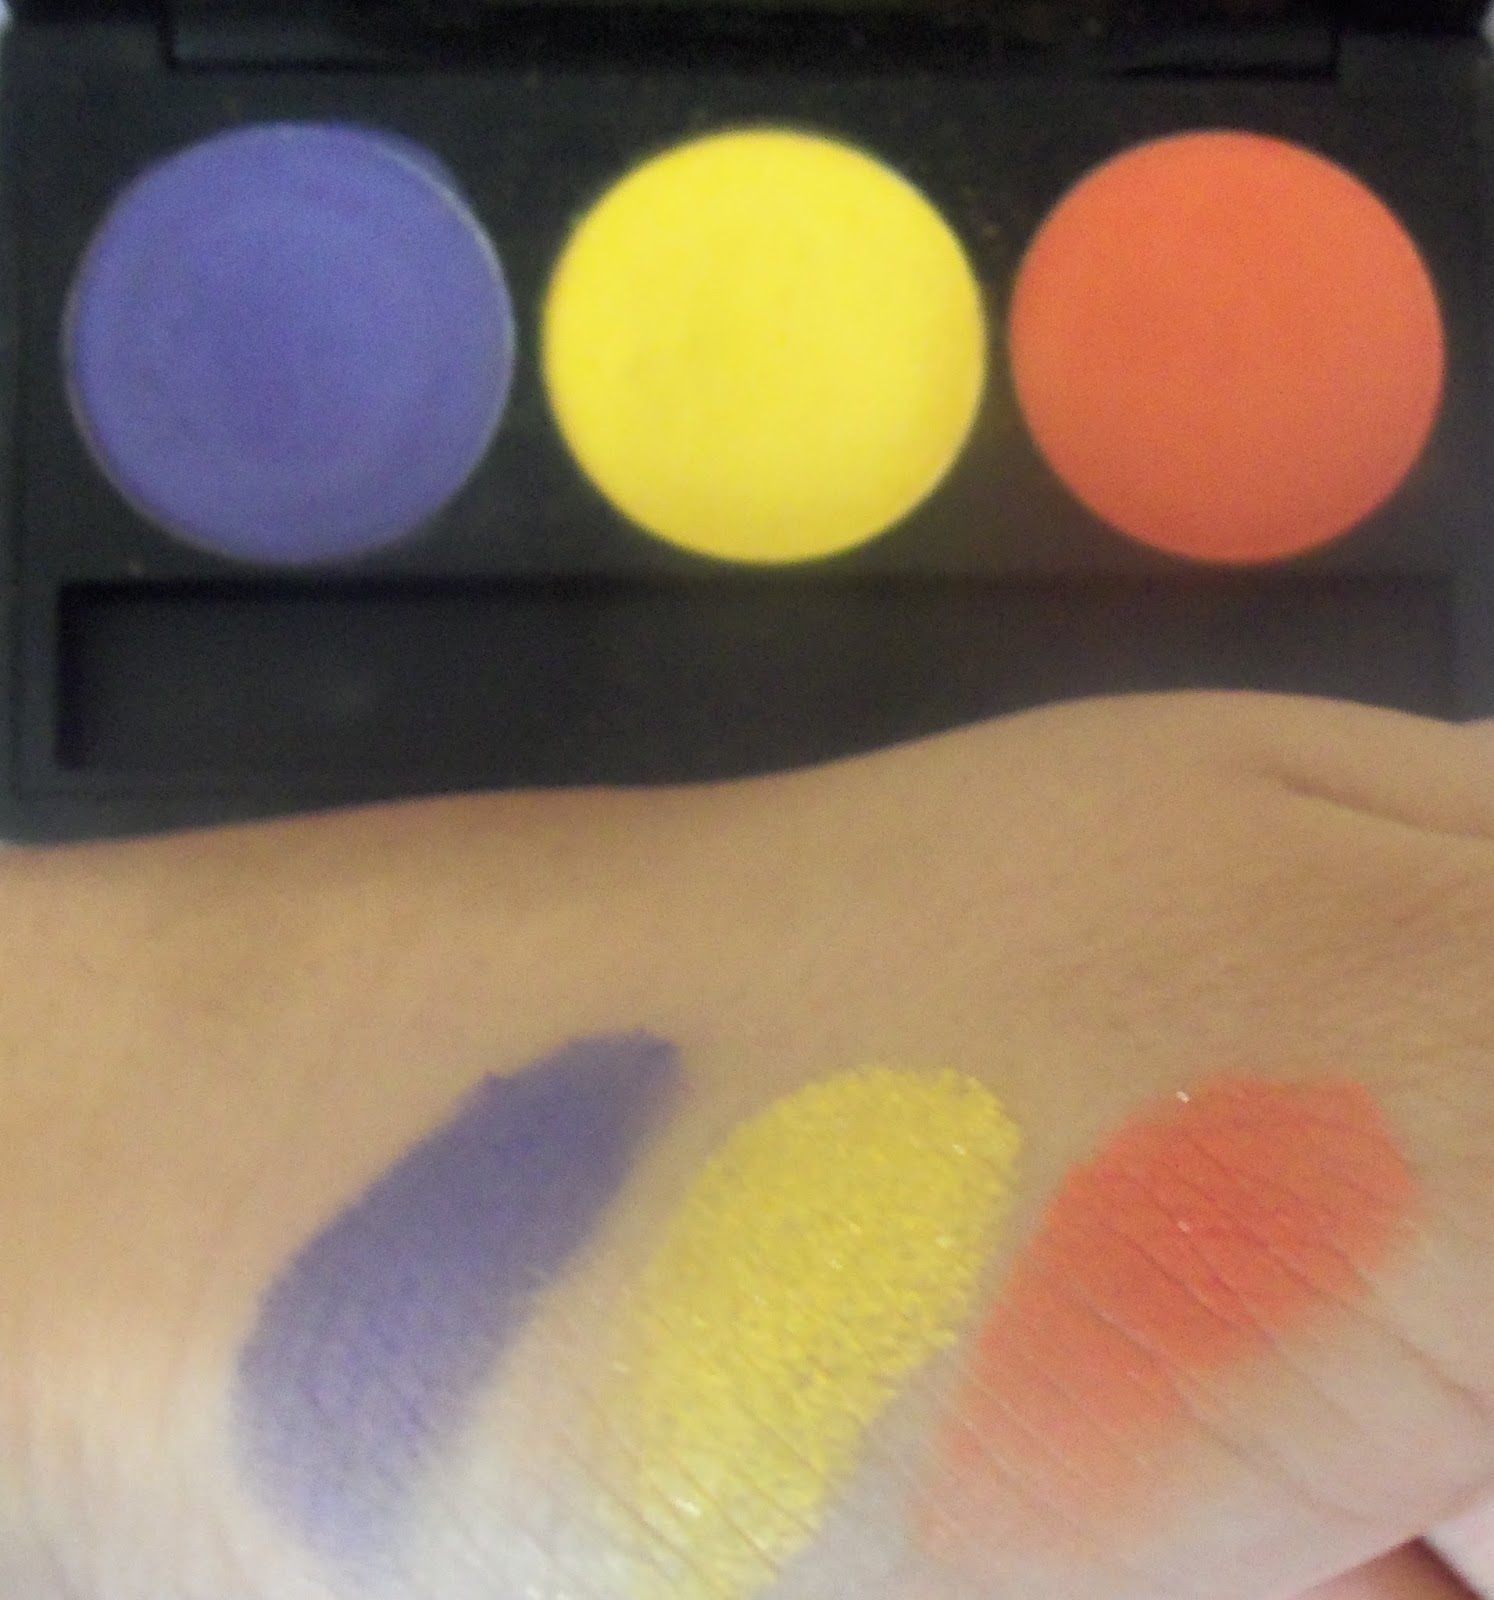 inglot eye palette yellow orange purple